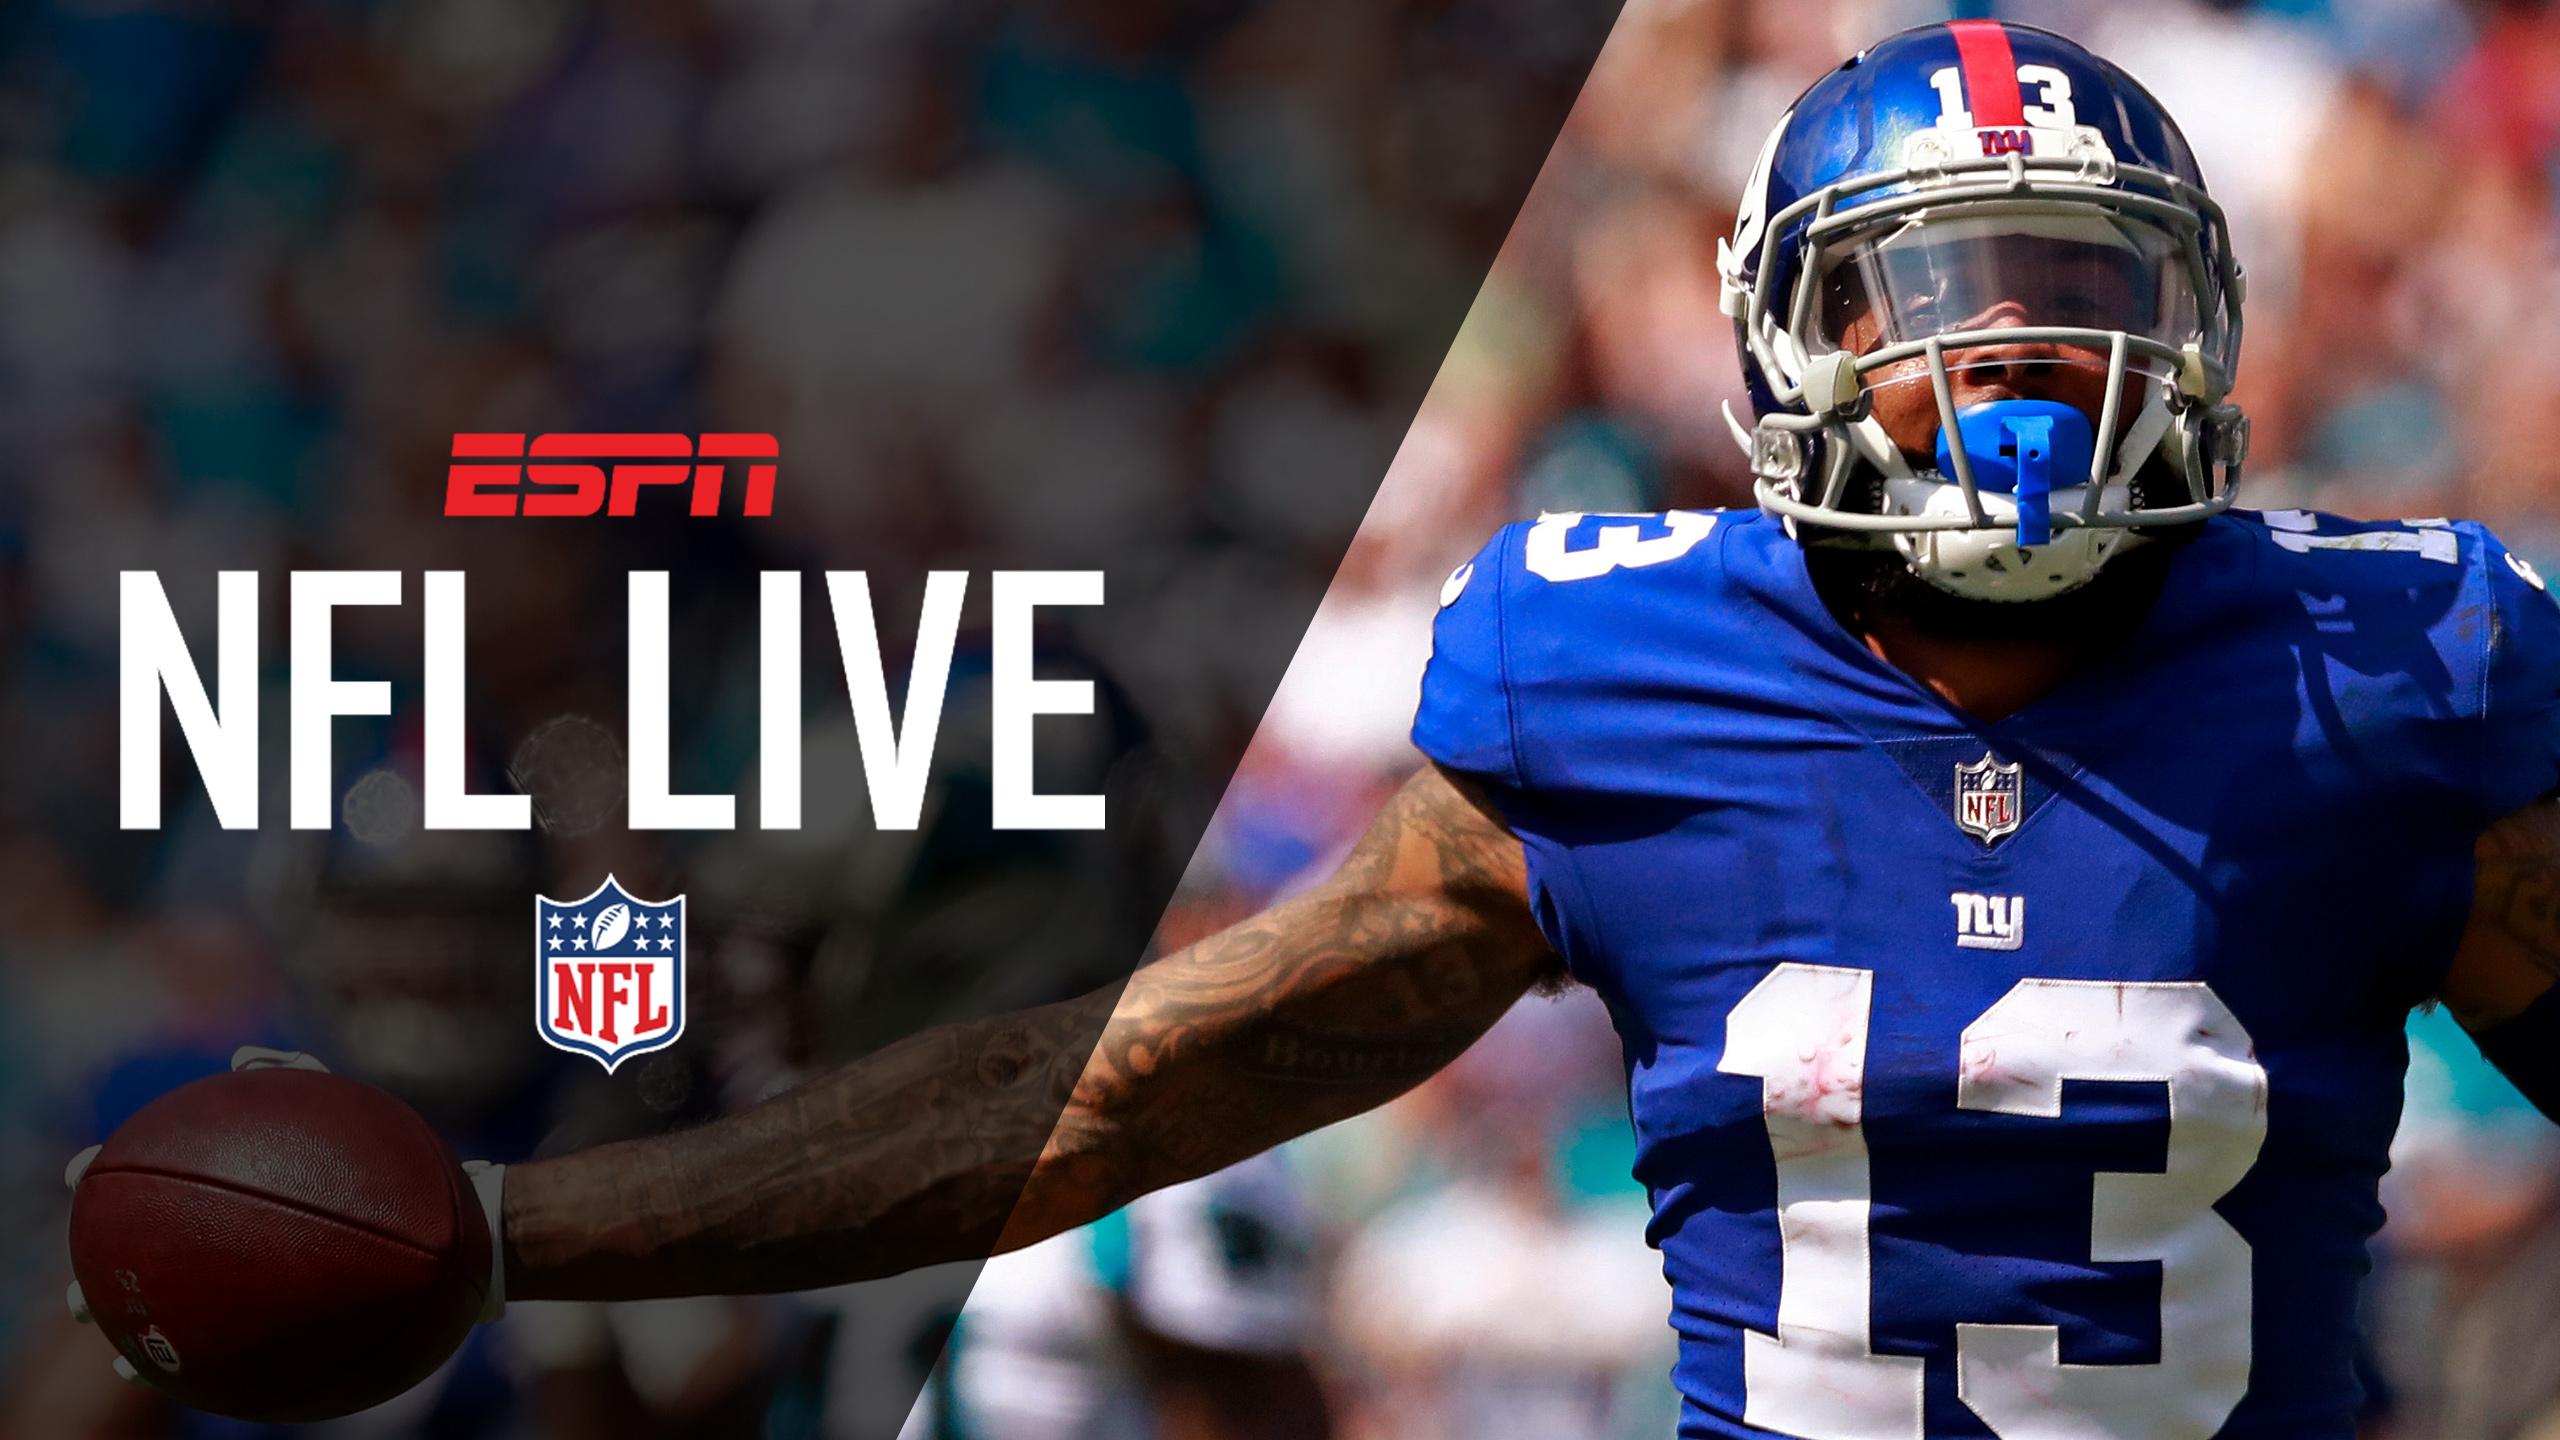 NFL Live